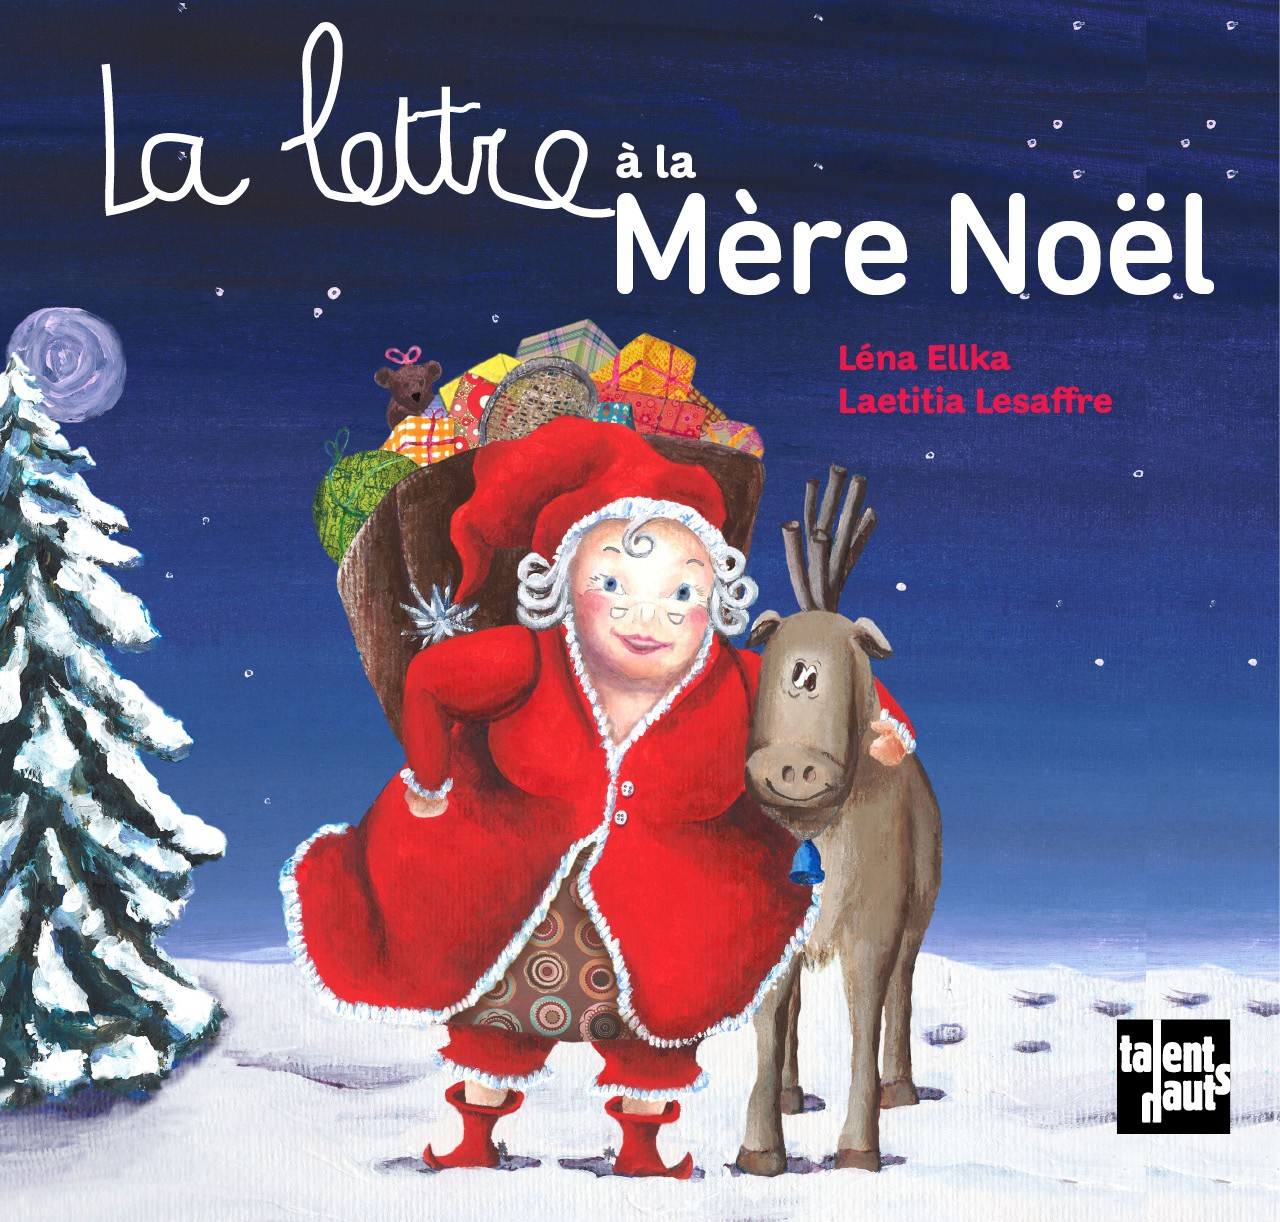 Image De Noel Drole.La Lettre A La Mere Noel